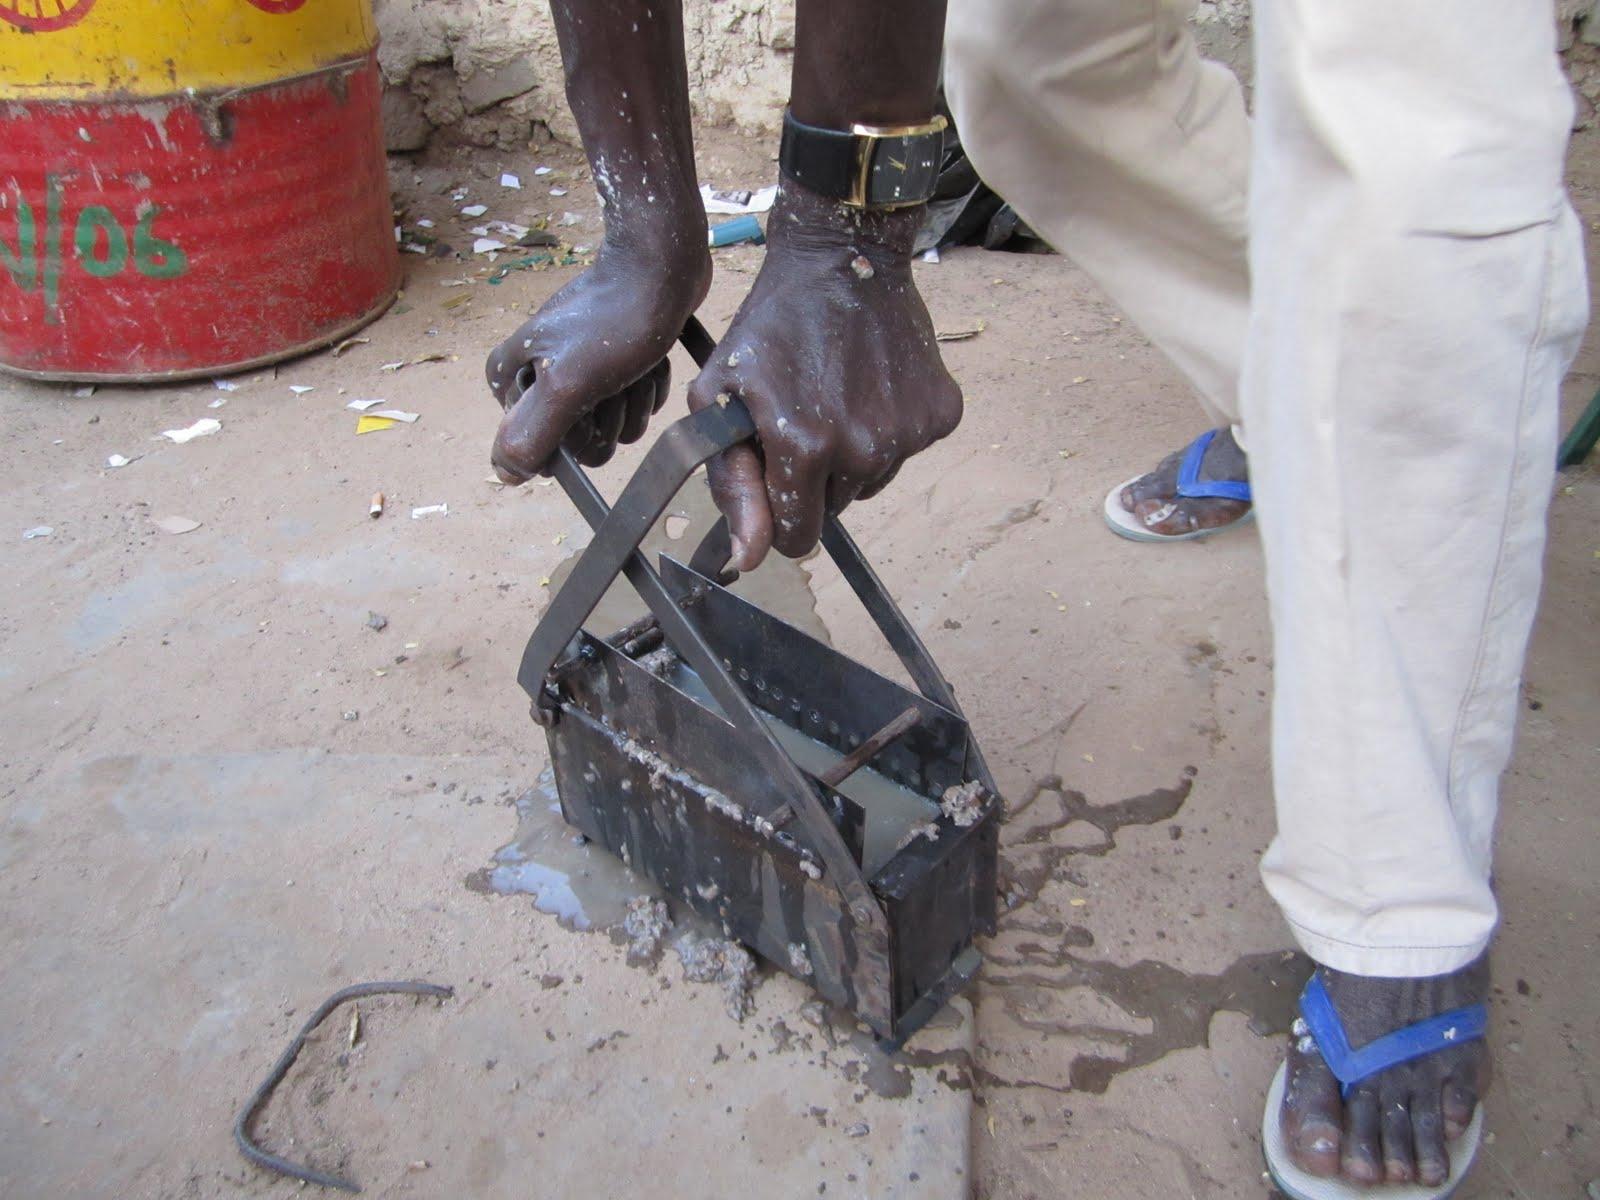 Африка. Переработка мусора в брикеты для печи. bumazhnyie briketyi